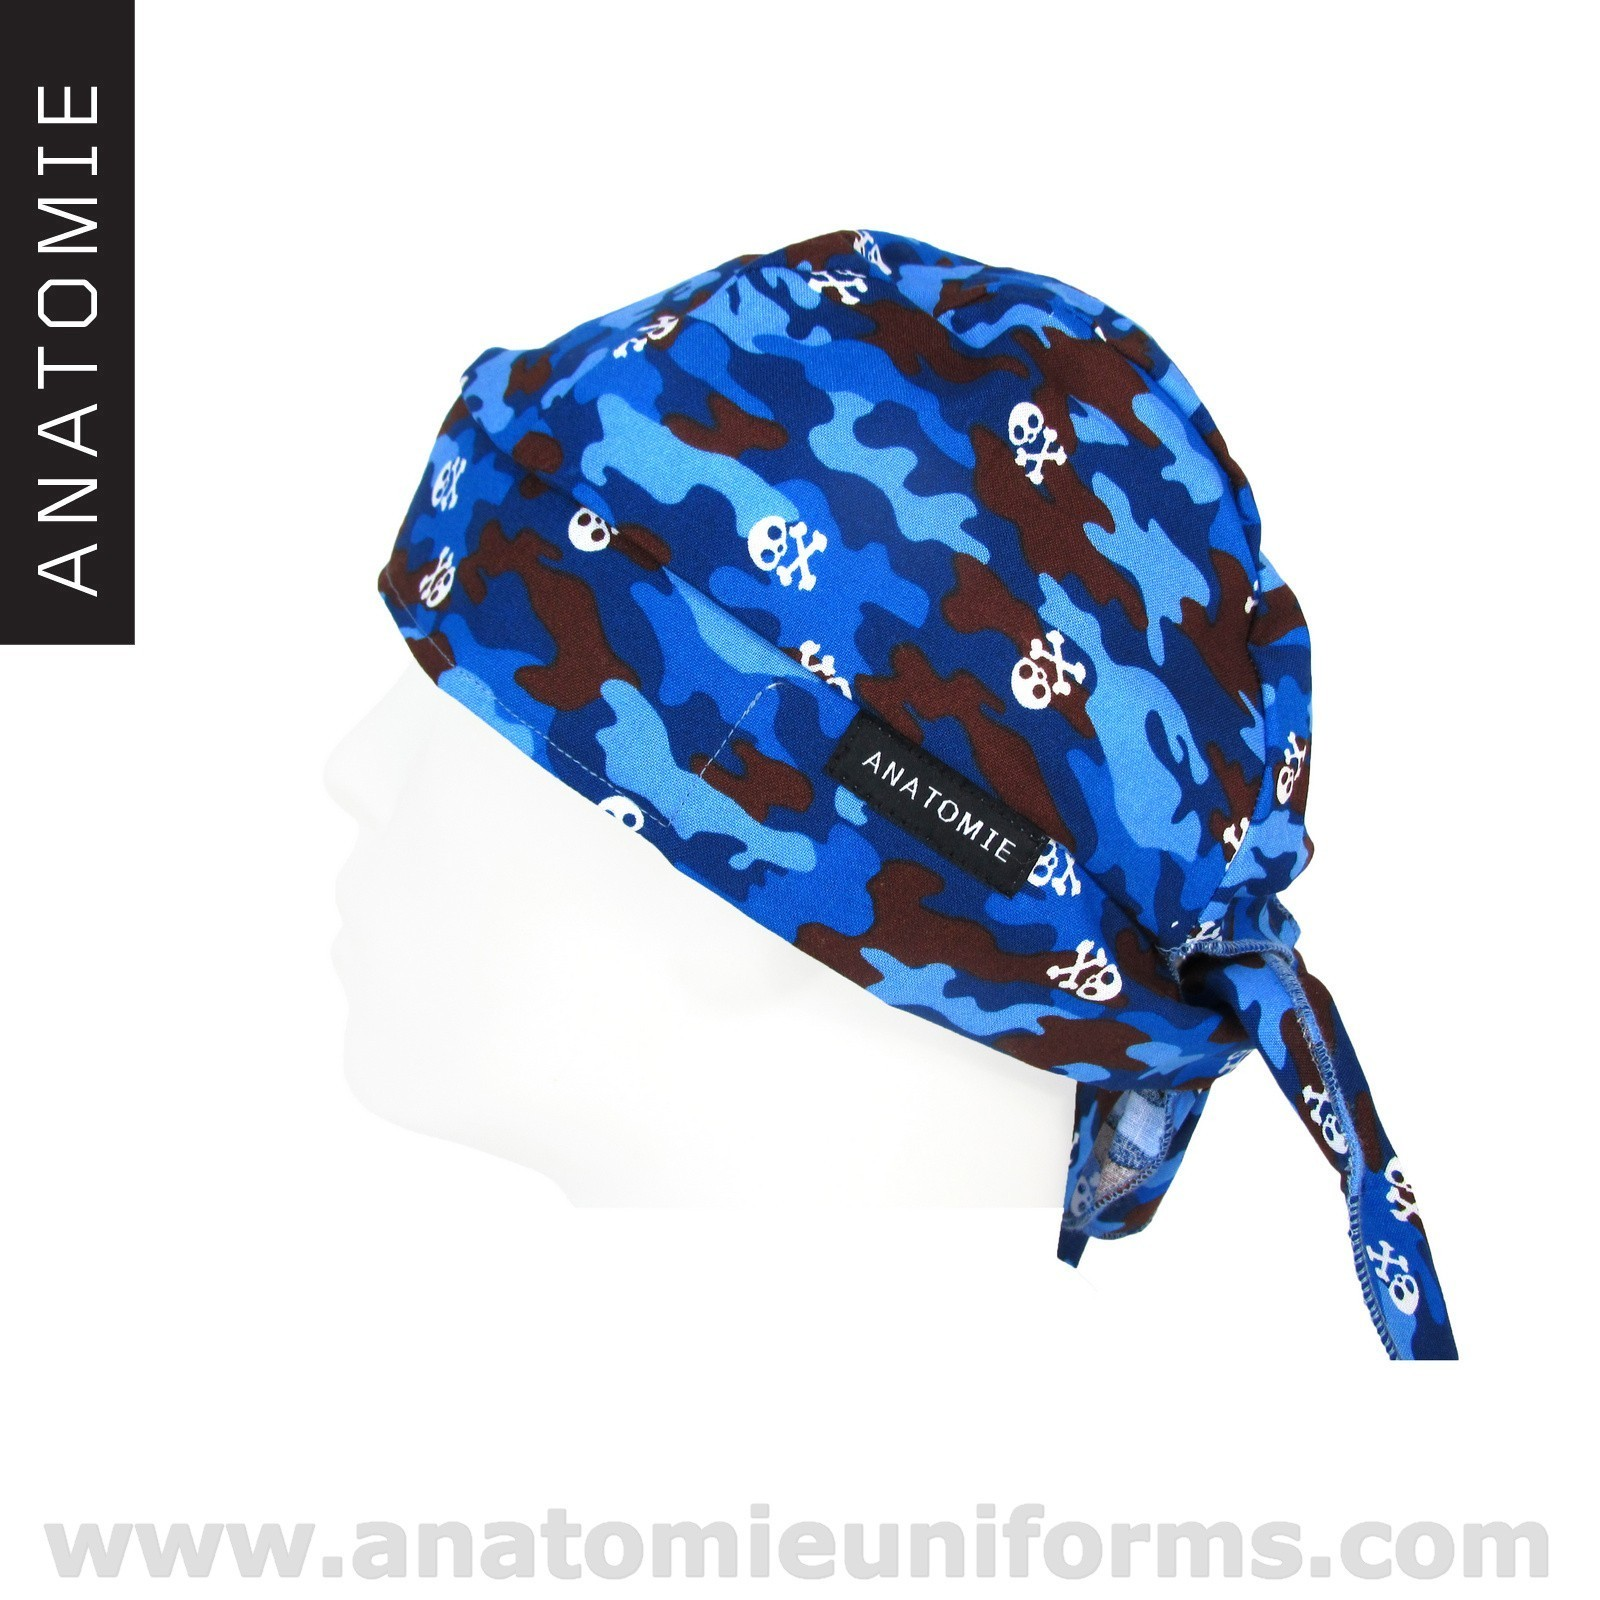 ANATOMIE BANDANA Quirofano Camuflaje Azul - 019